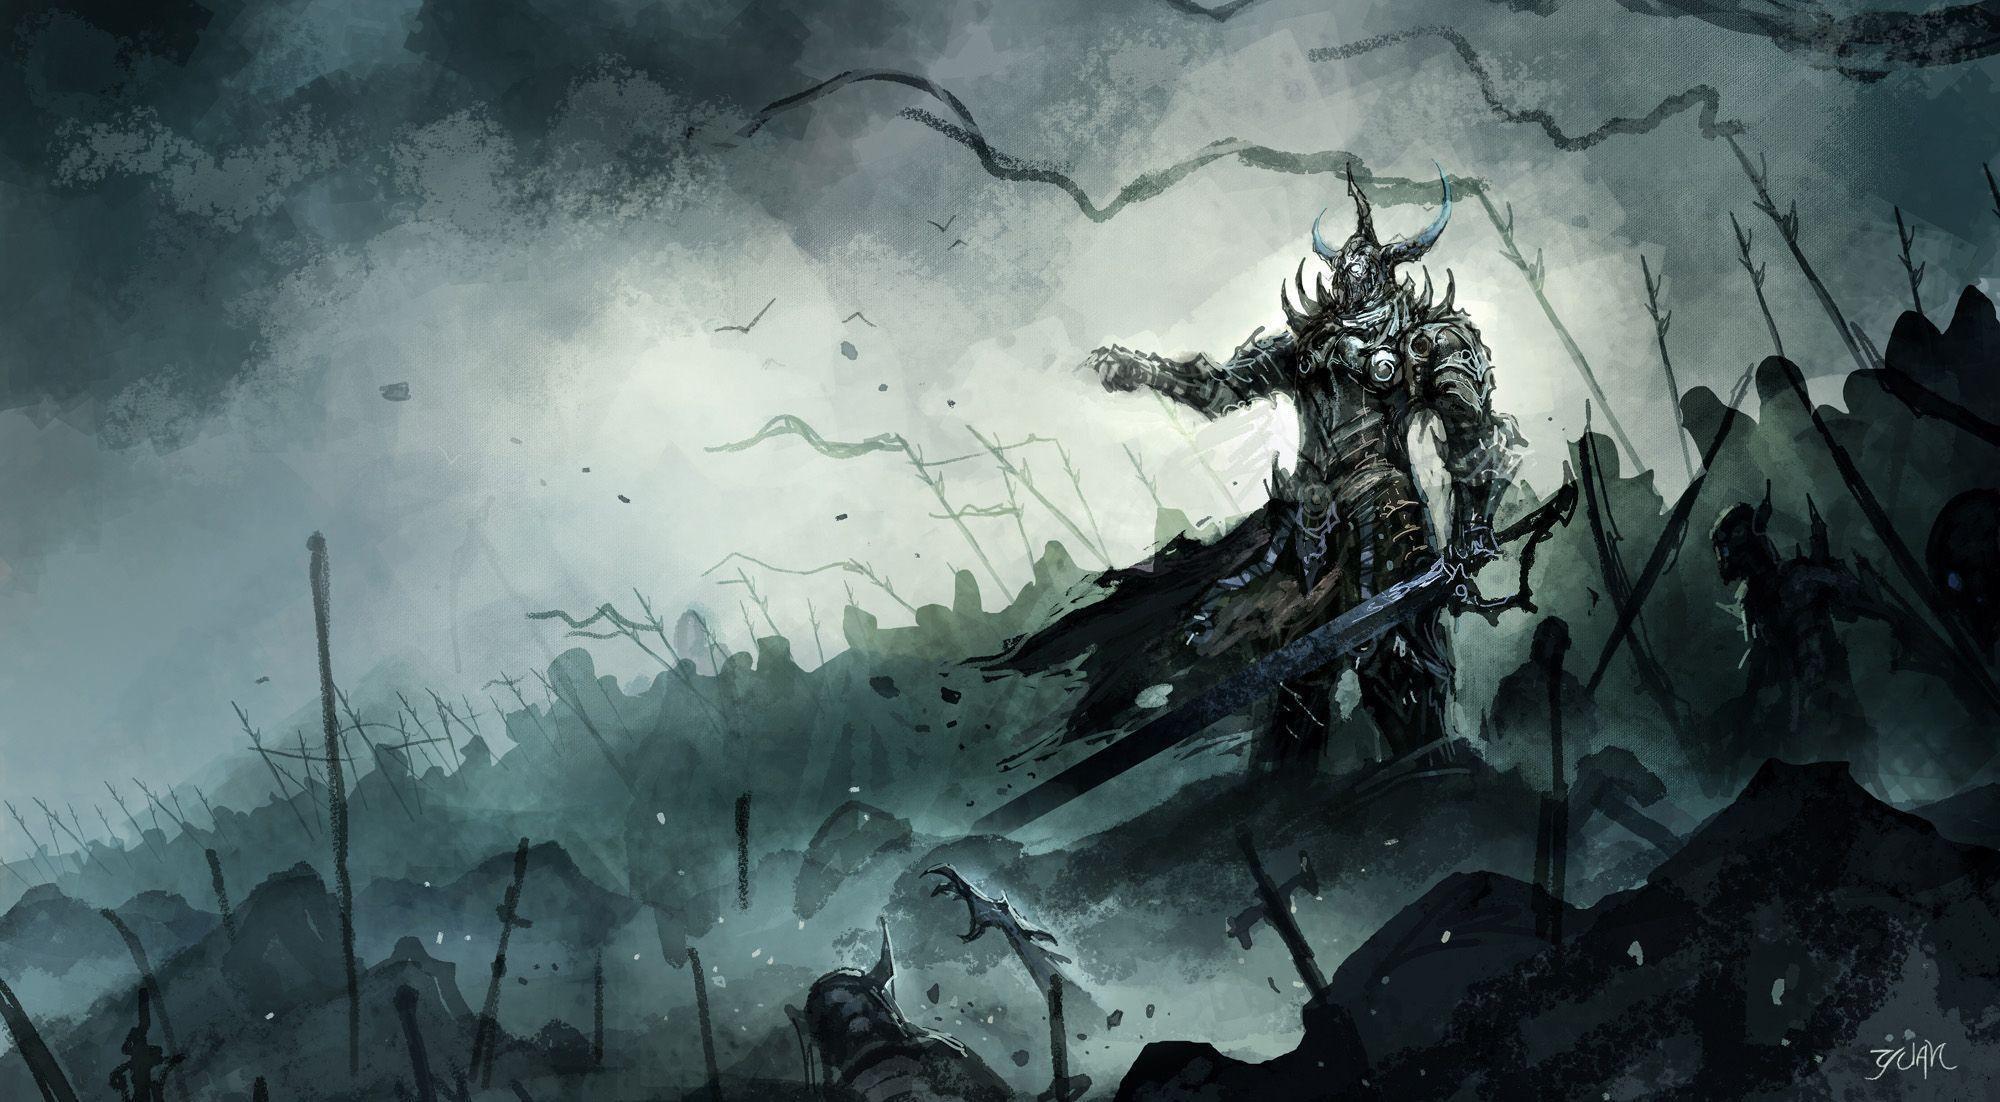 Epic Gaming Wallpapers | Free | Download